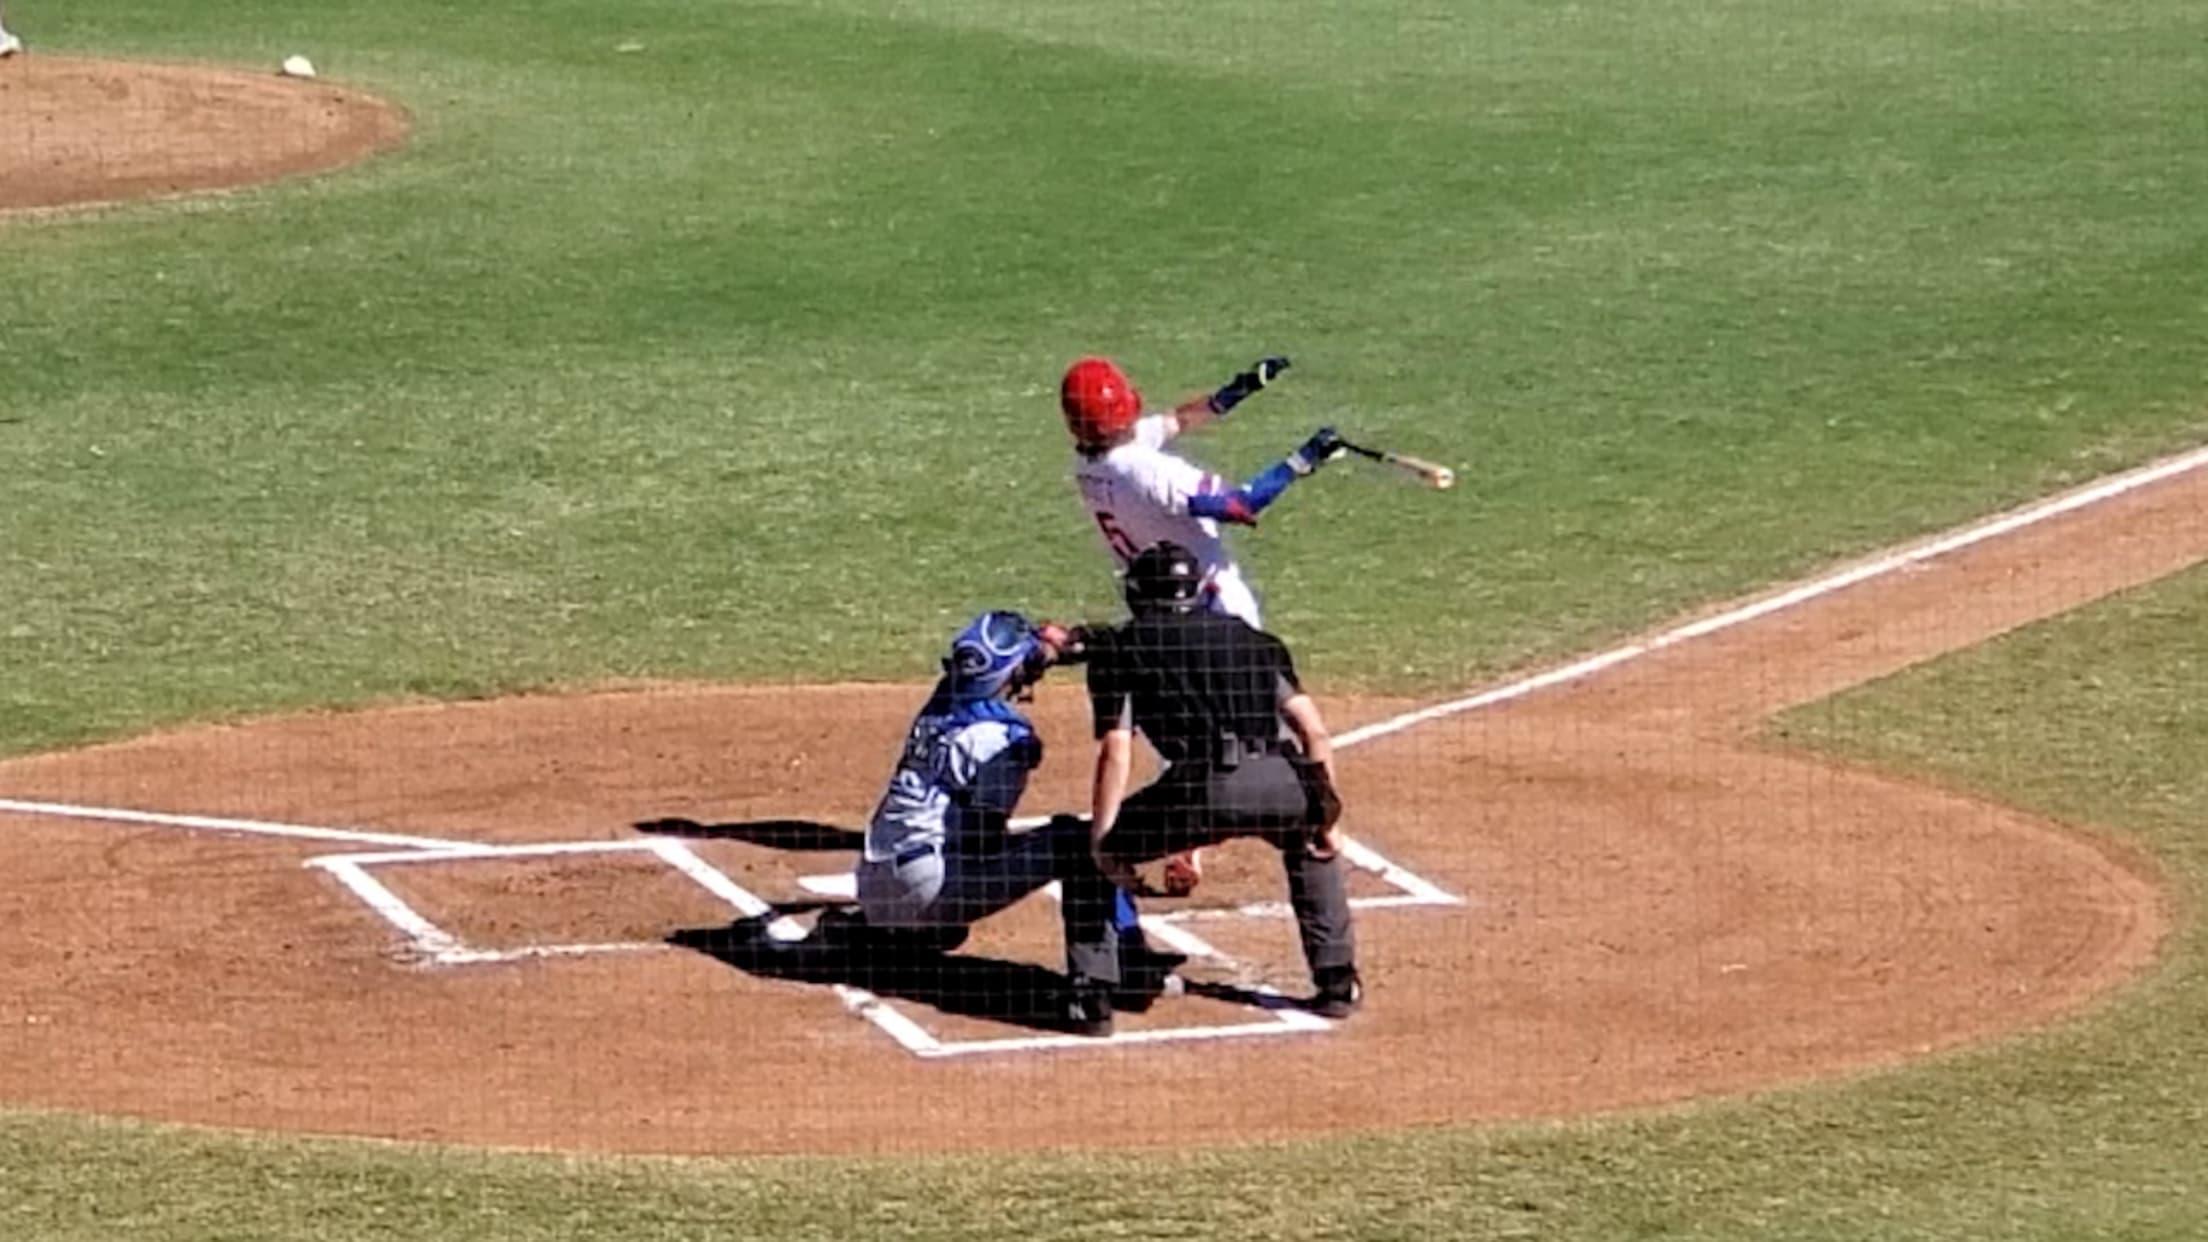 Bryson Stott's 4-hit game